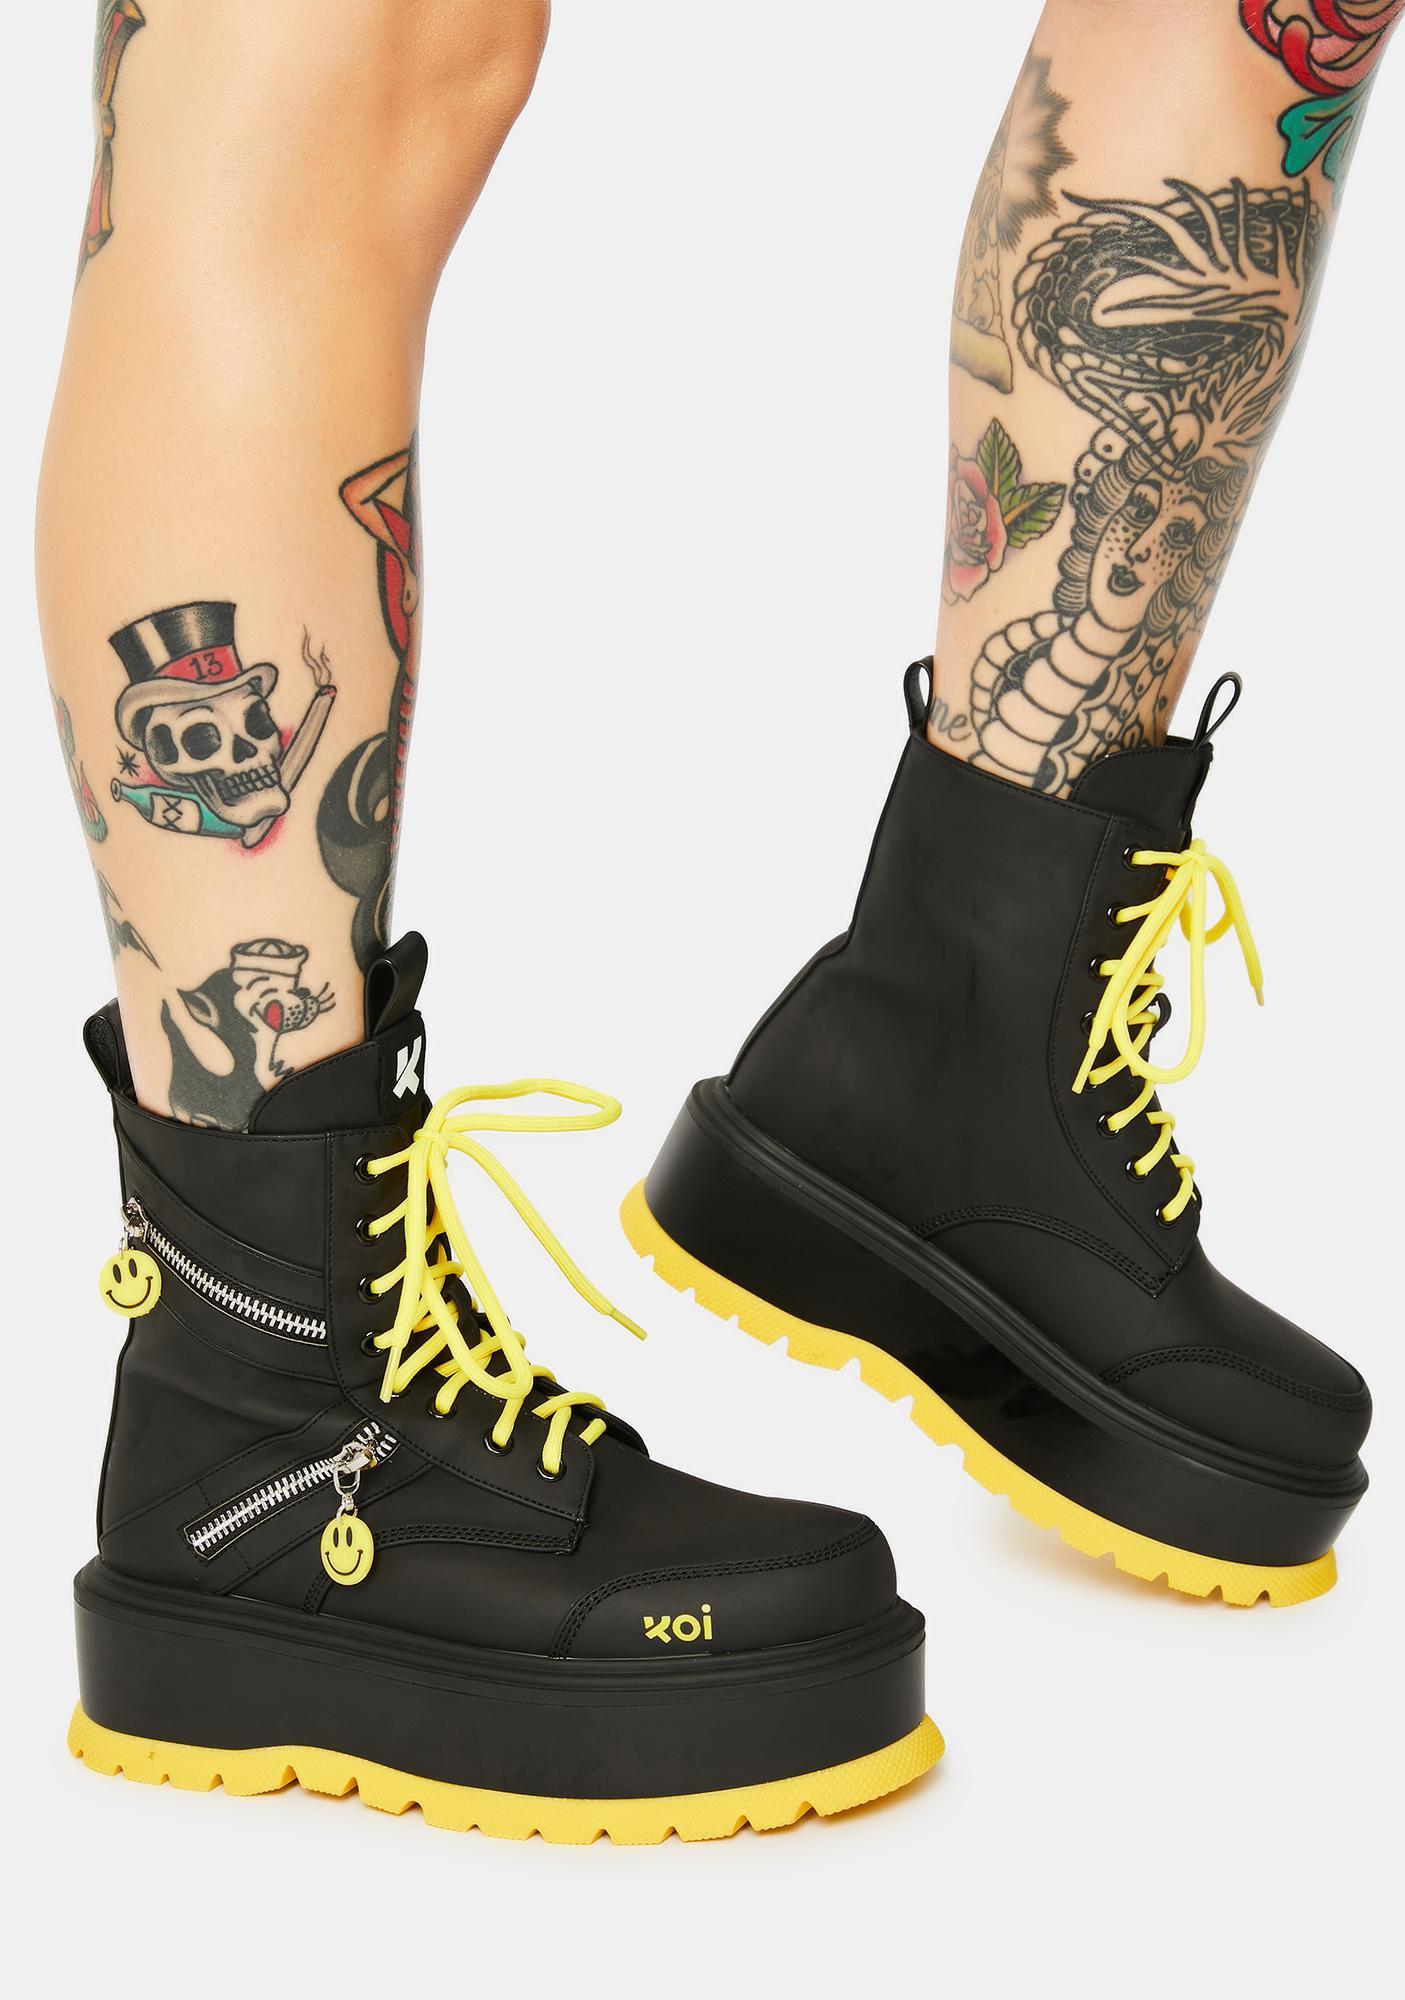 Koi Footwear Bassiani Smiley Face Platform Boots